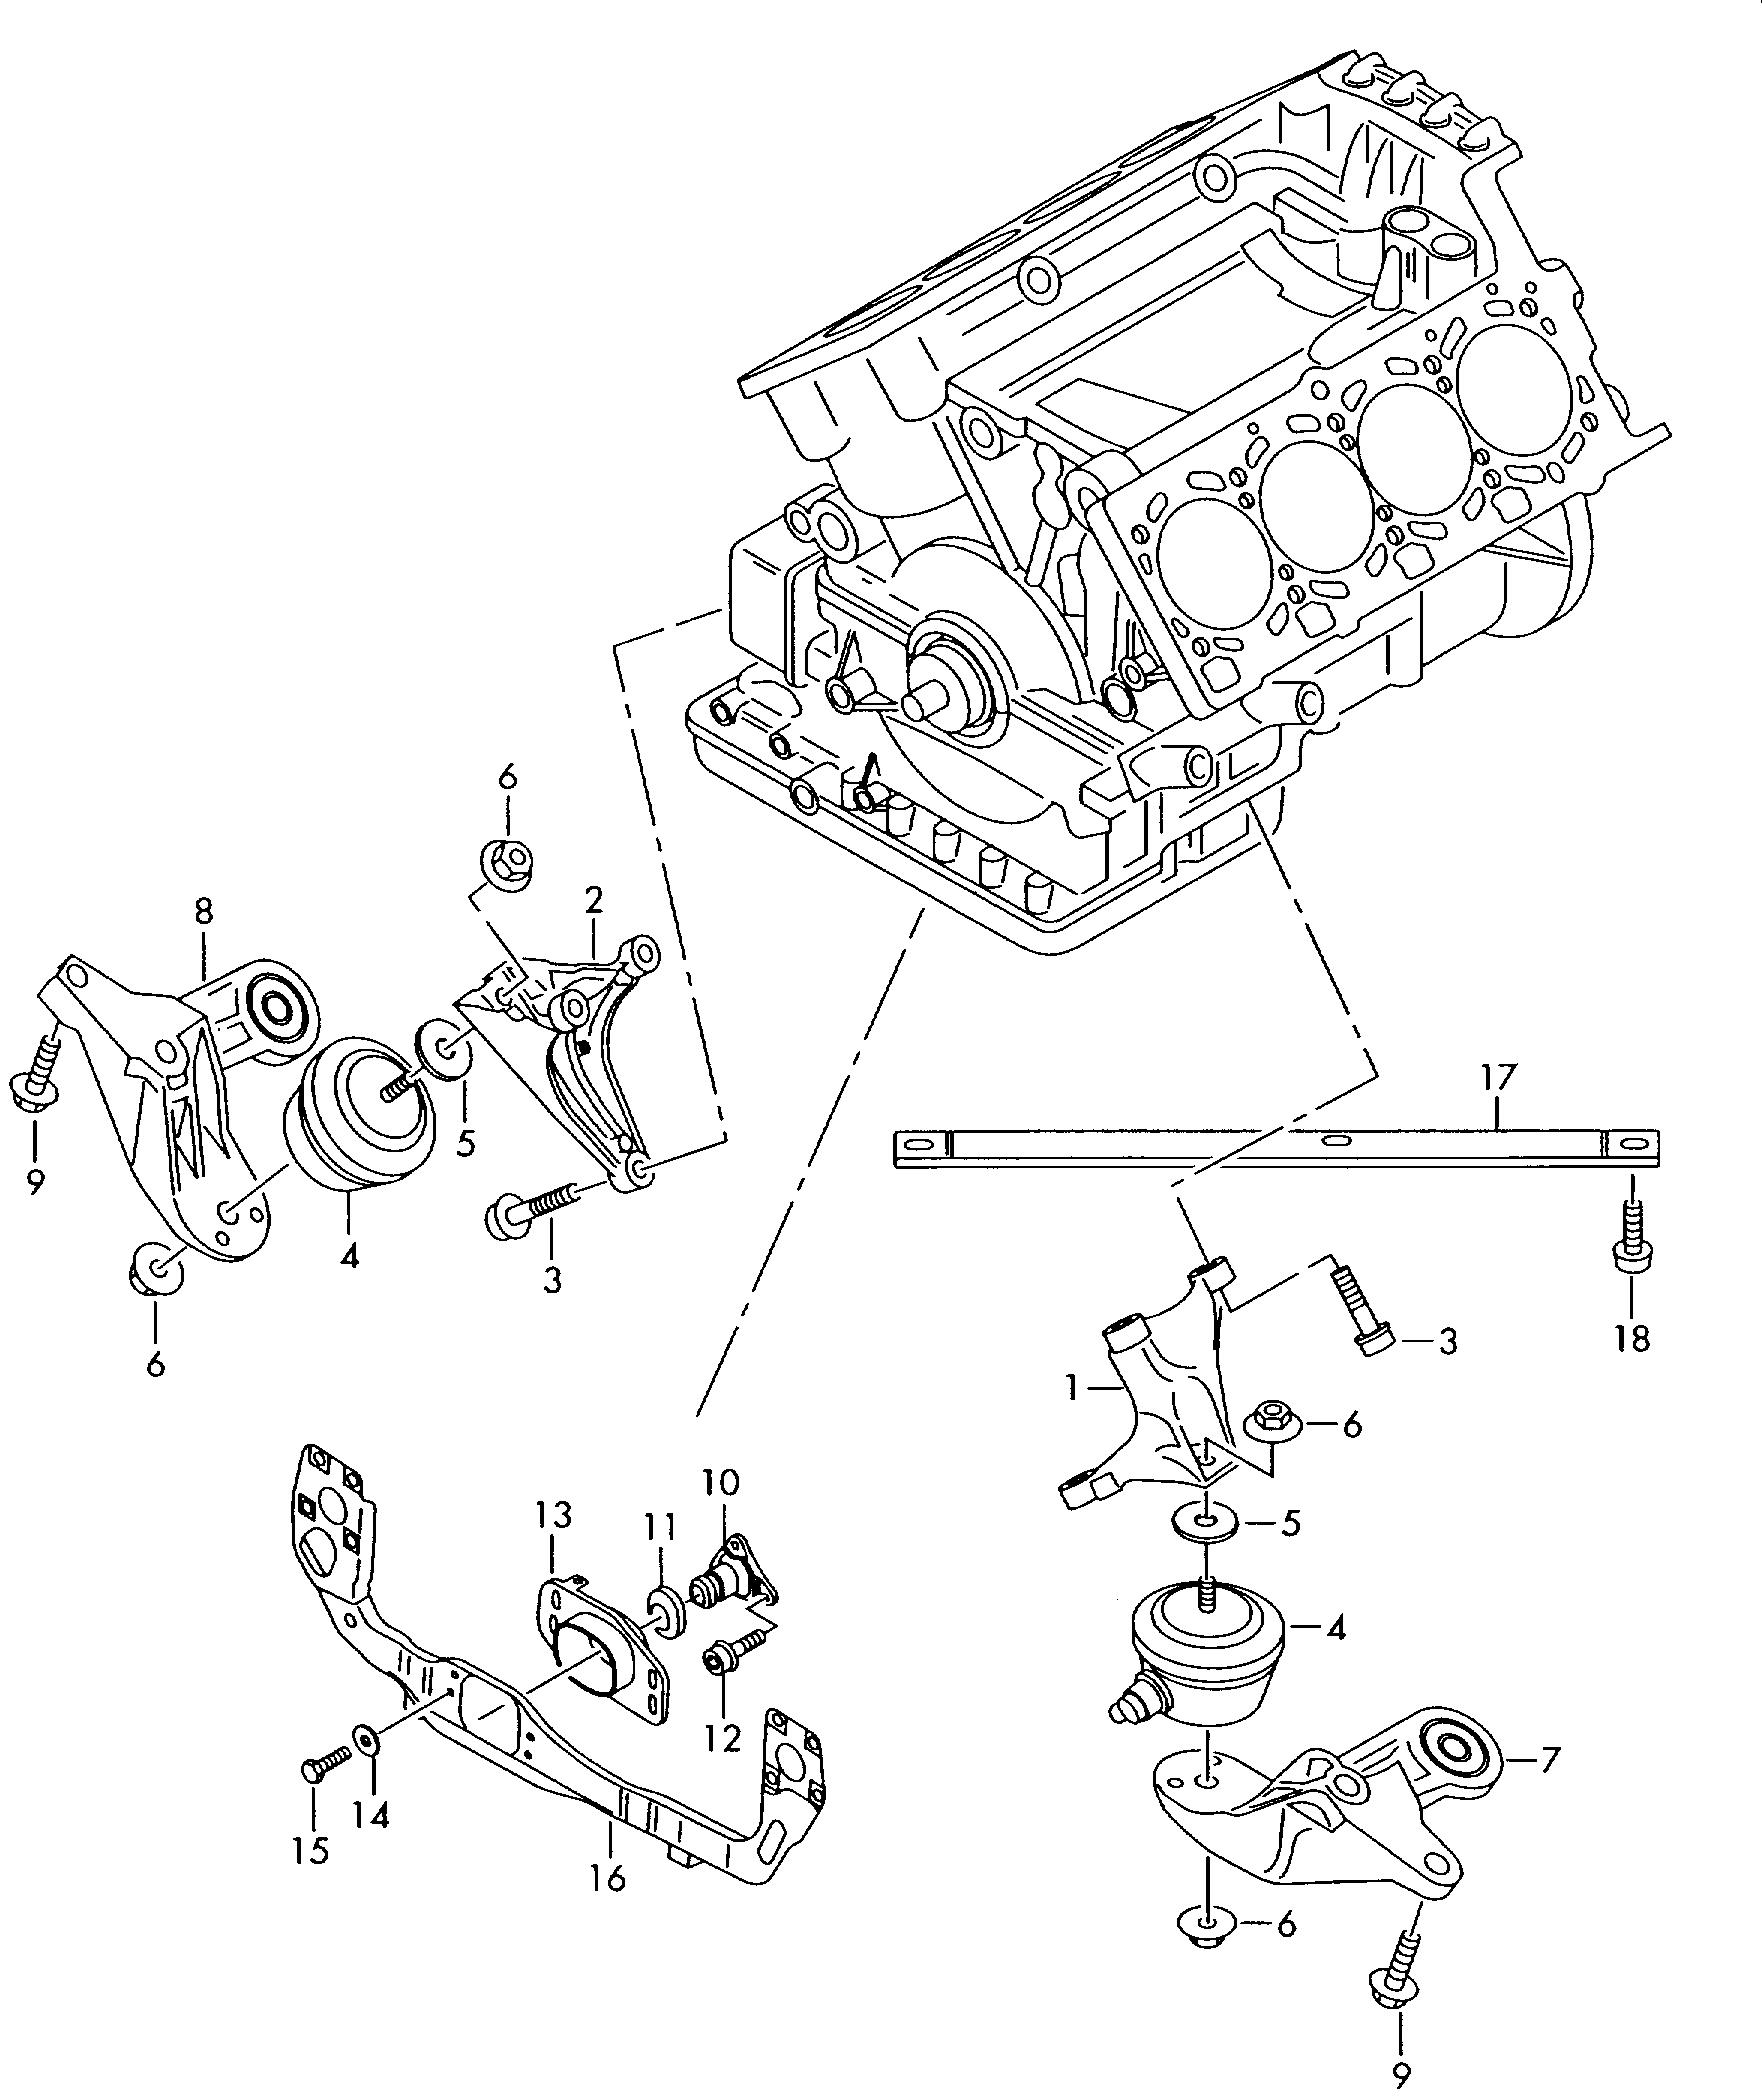 Audi A4/S4 Cabrio./qu (2003 - 2006) / VAG Etka